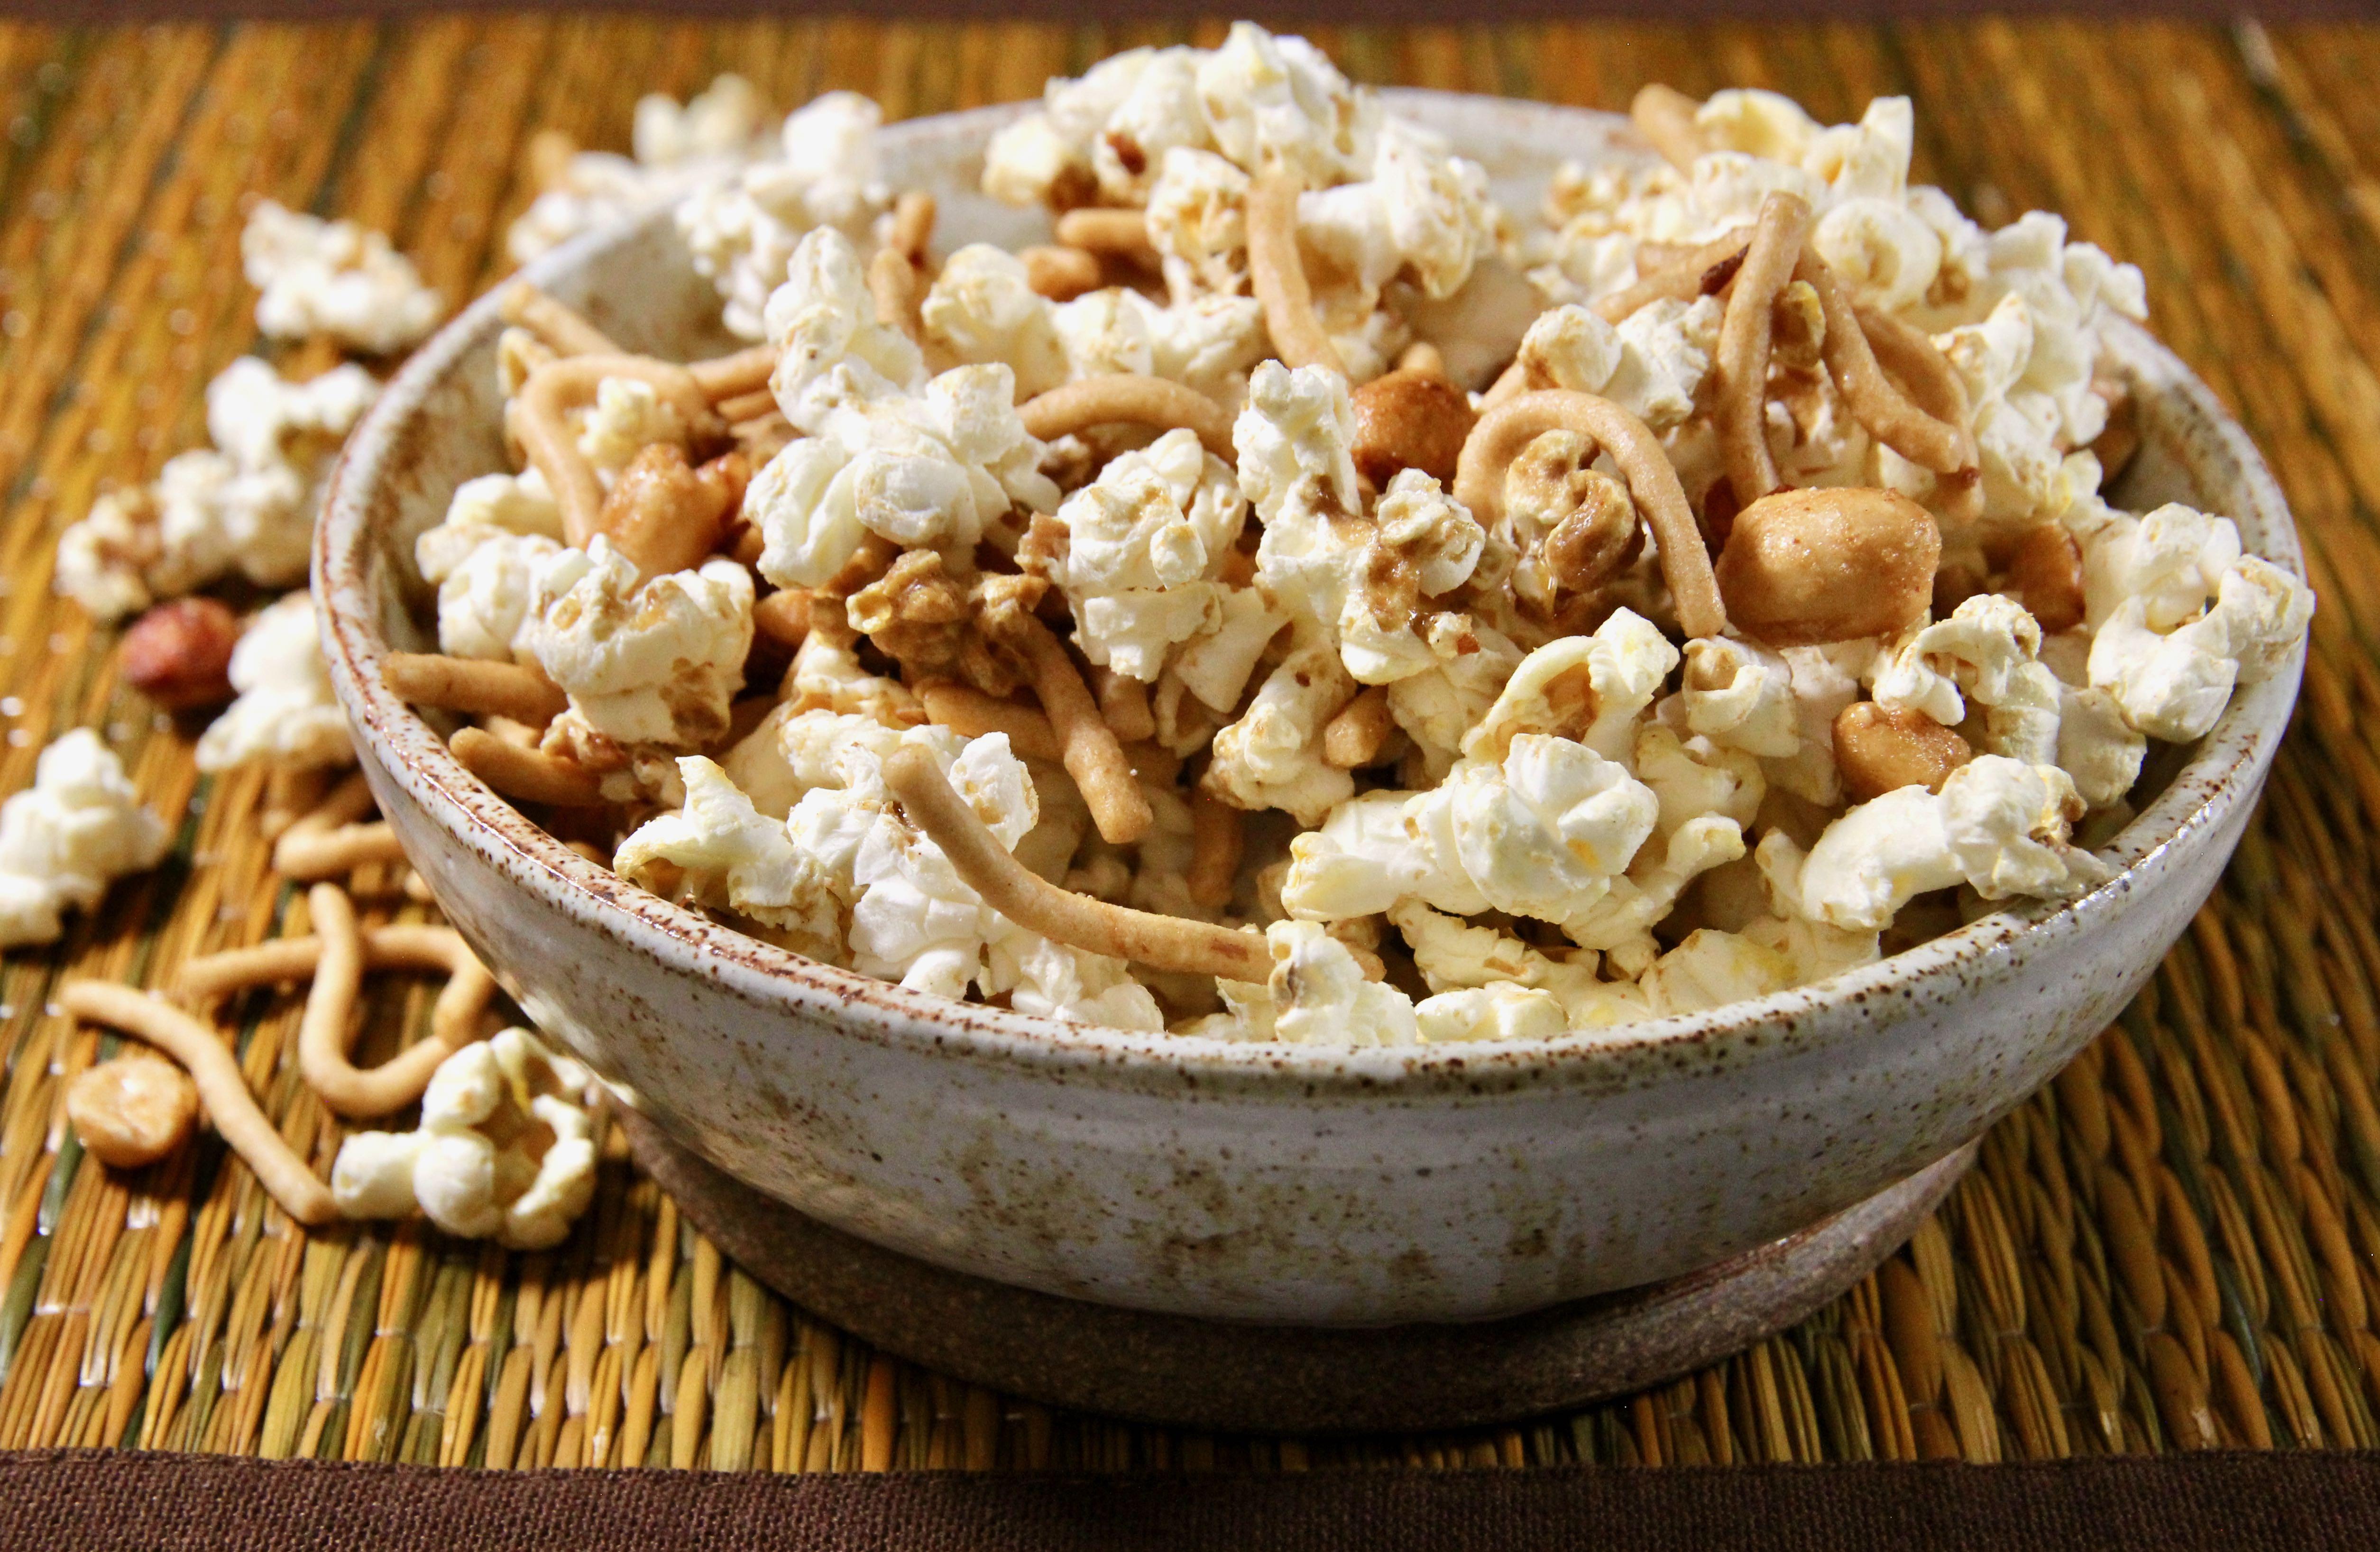 Chinese Popcorn Snack Mix